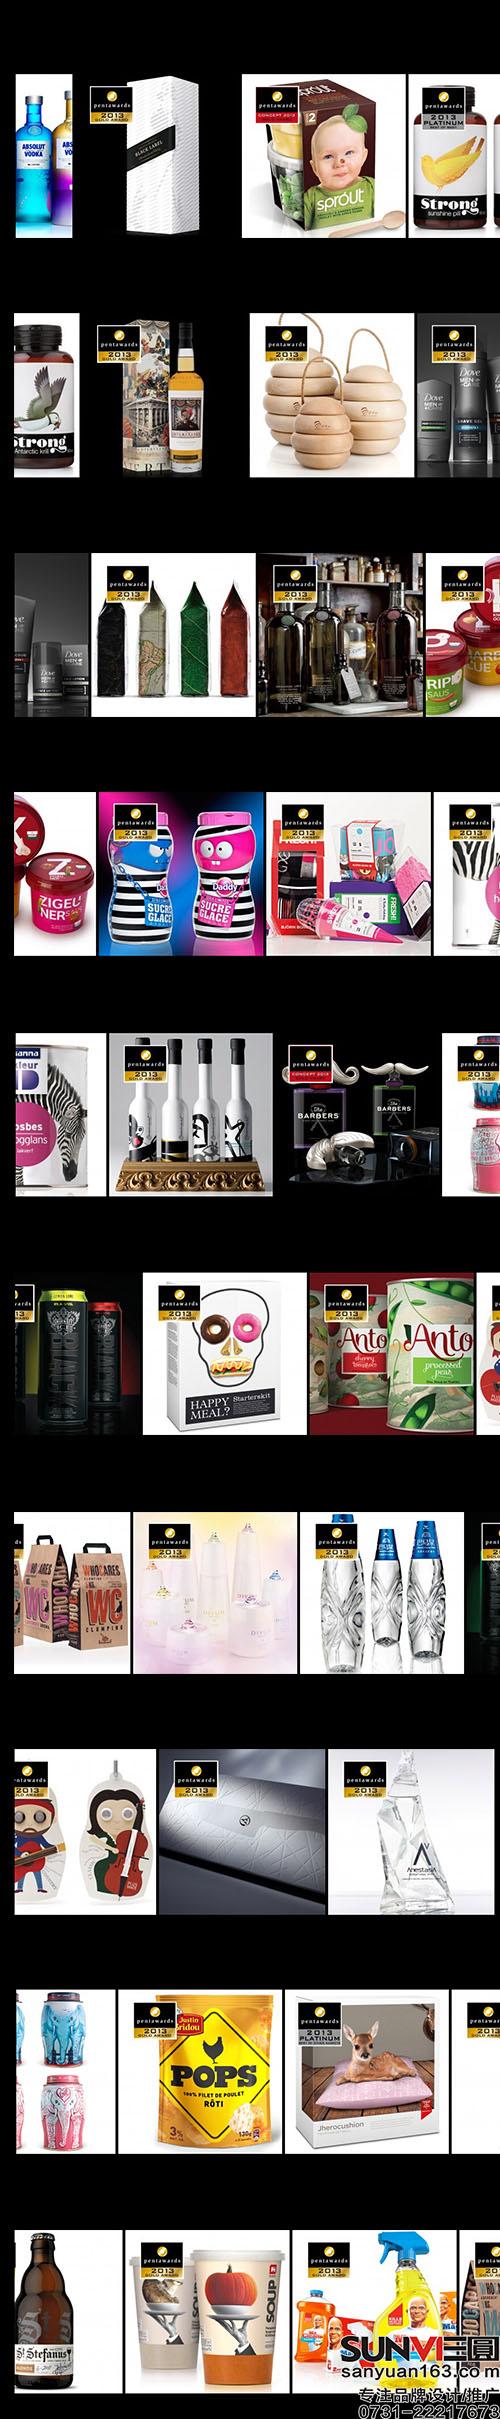 2013 pentawards国际包装设计大赛获奖作品赏析